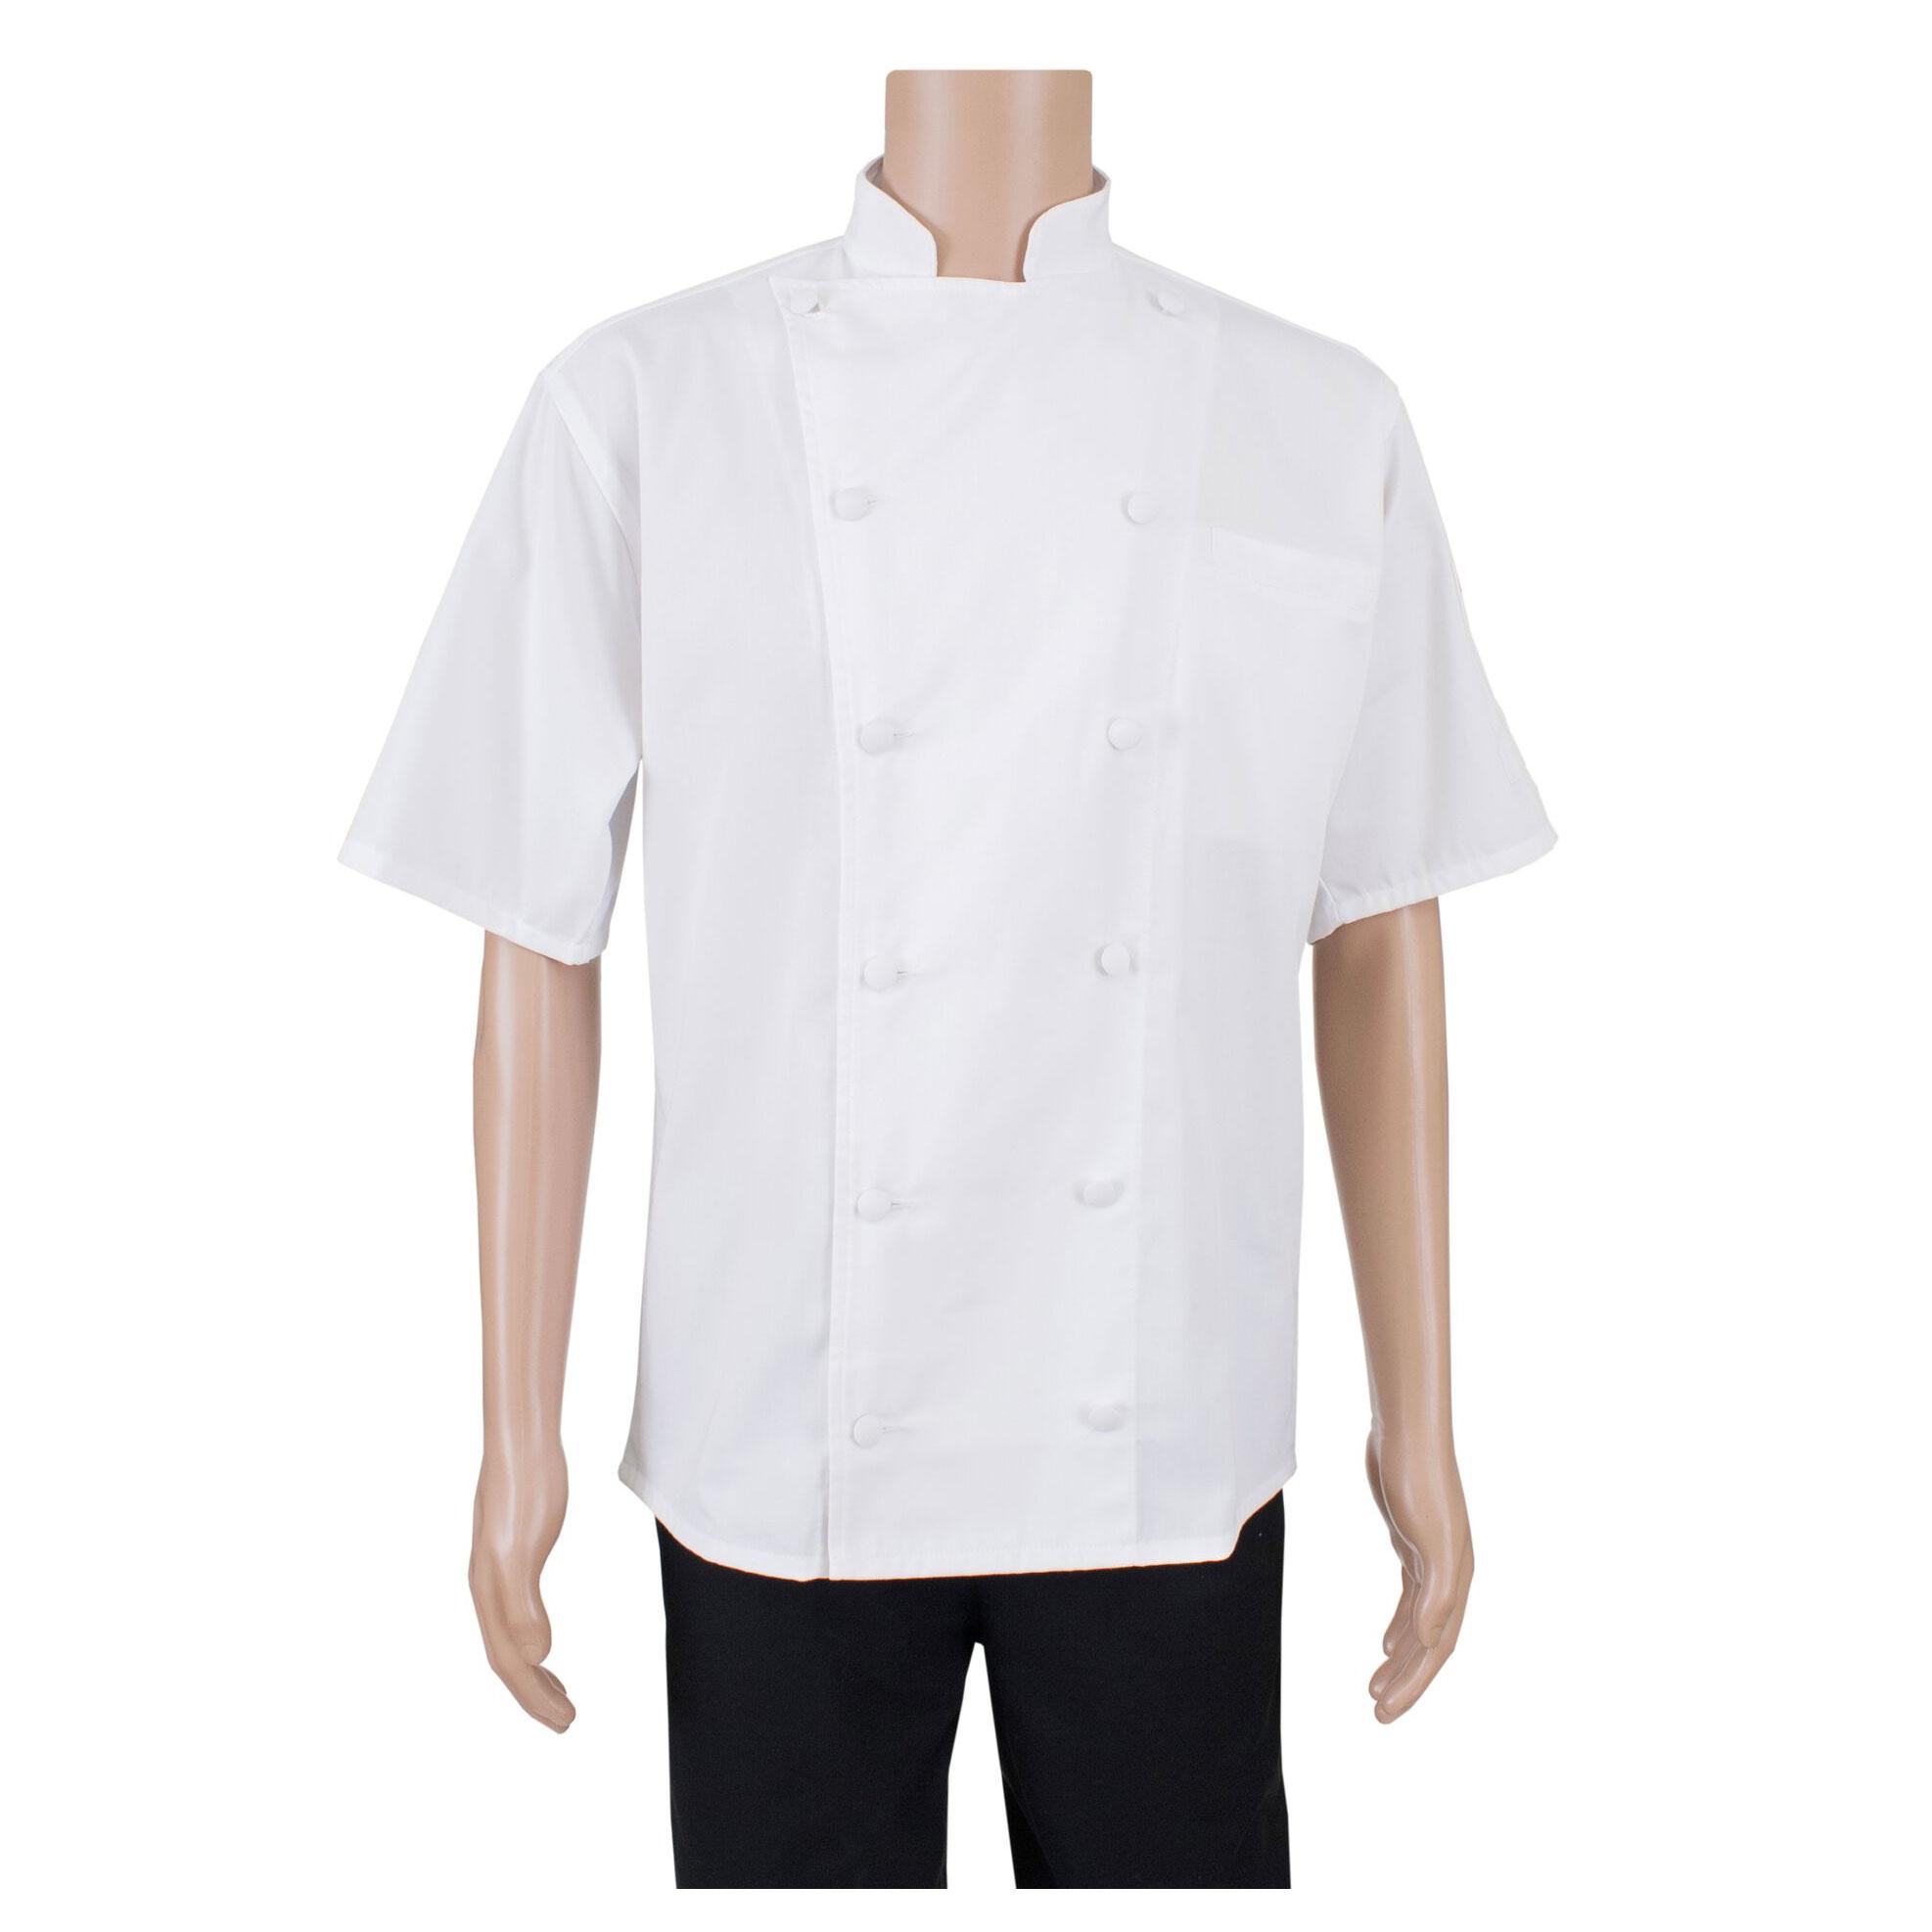 John Ritzenthaler Company RZSSWH1X chef's coat